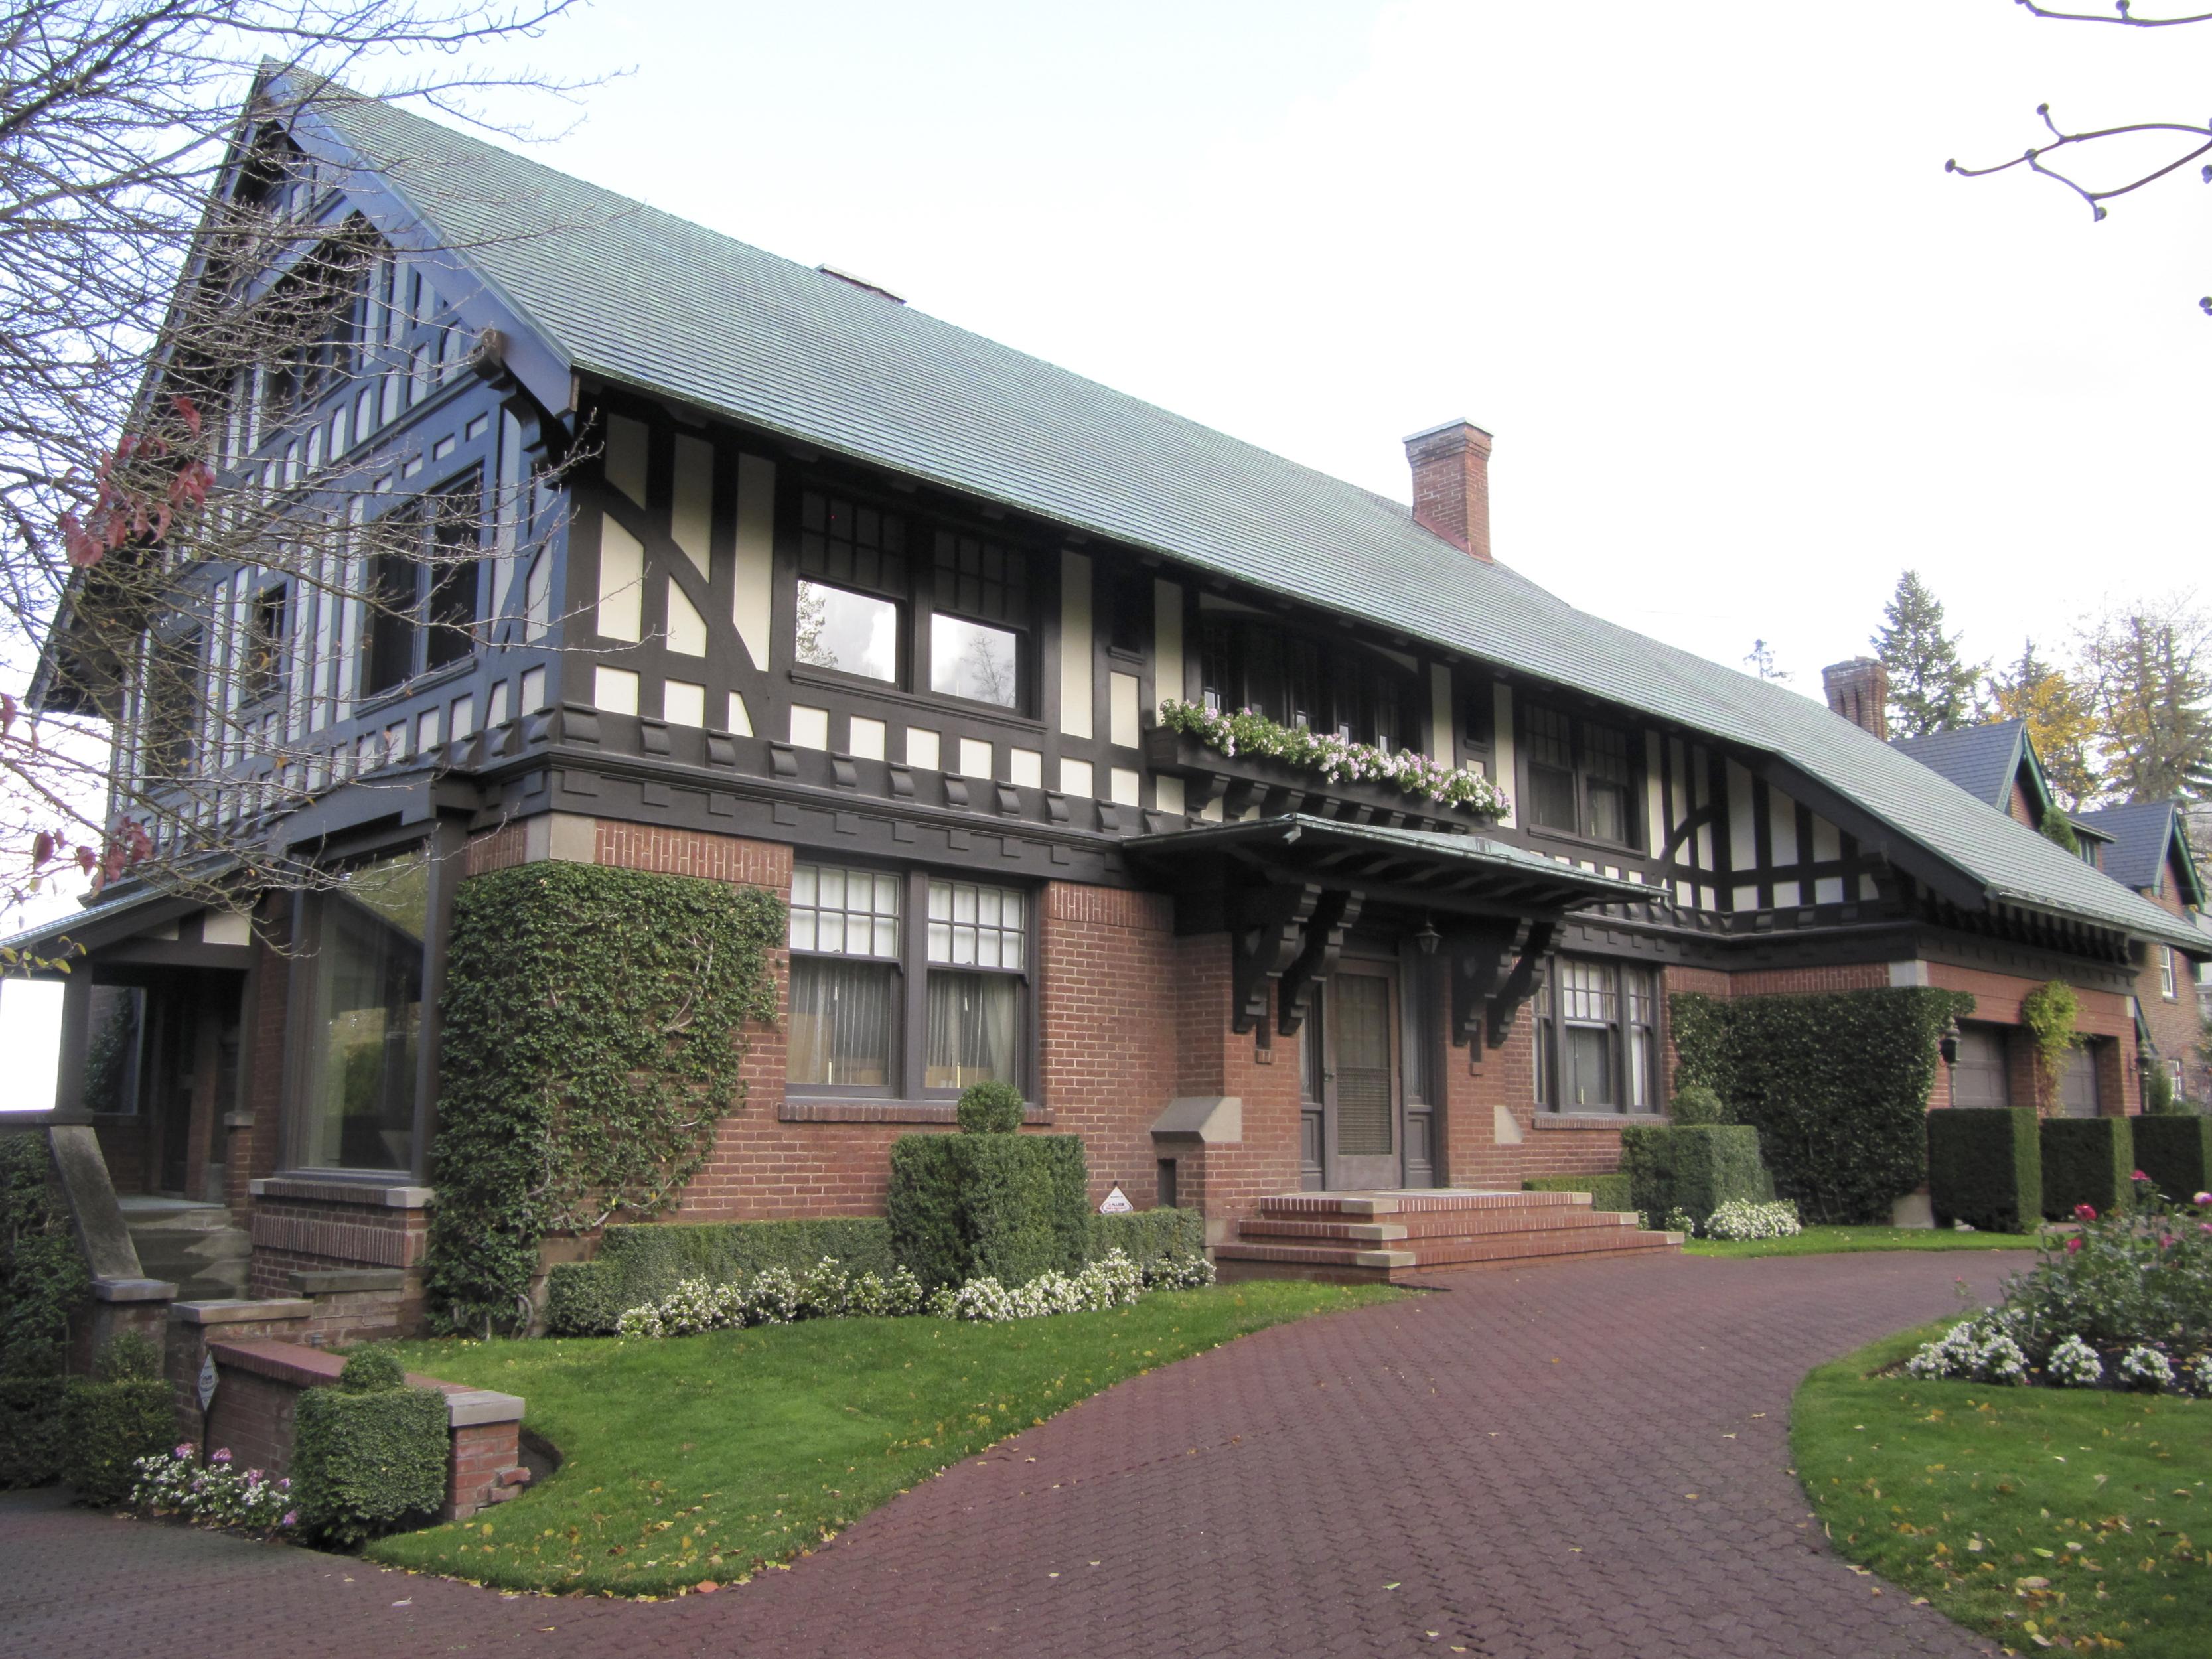 Matthews-Woldson House